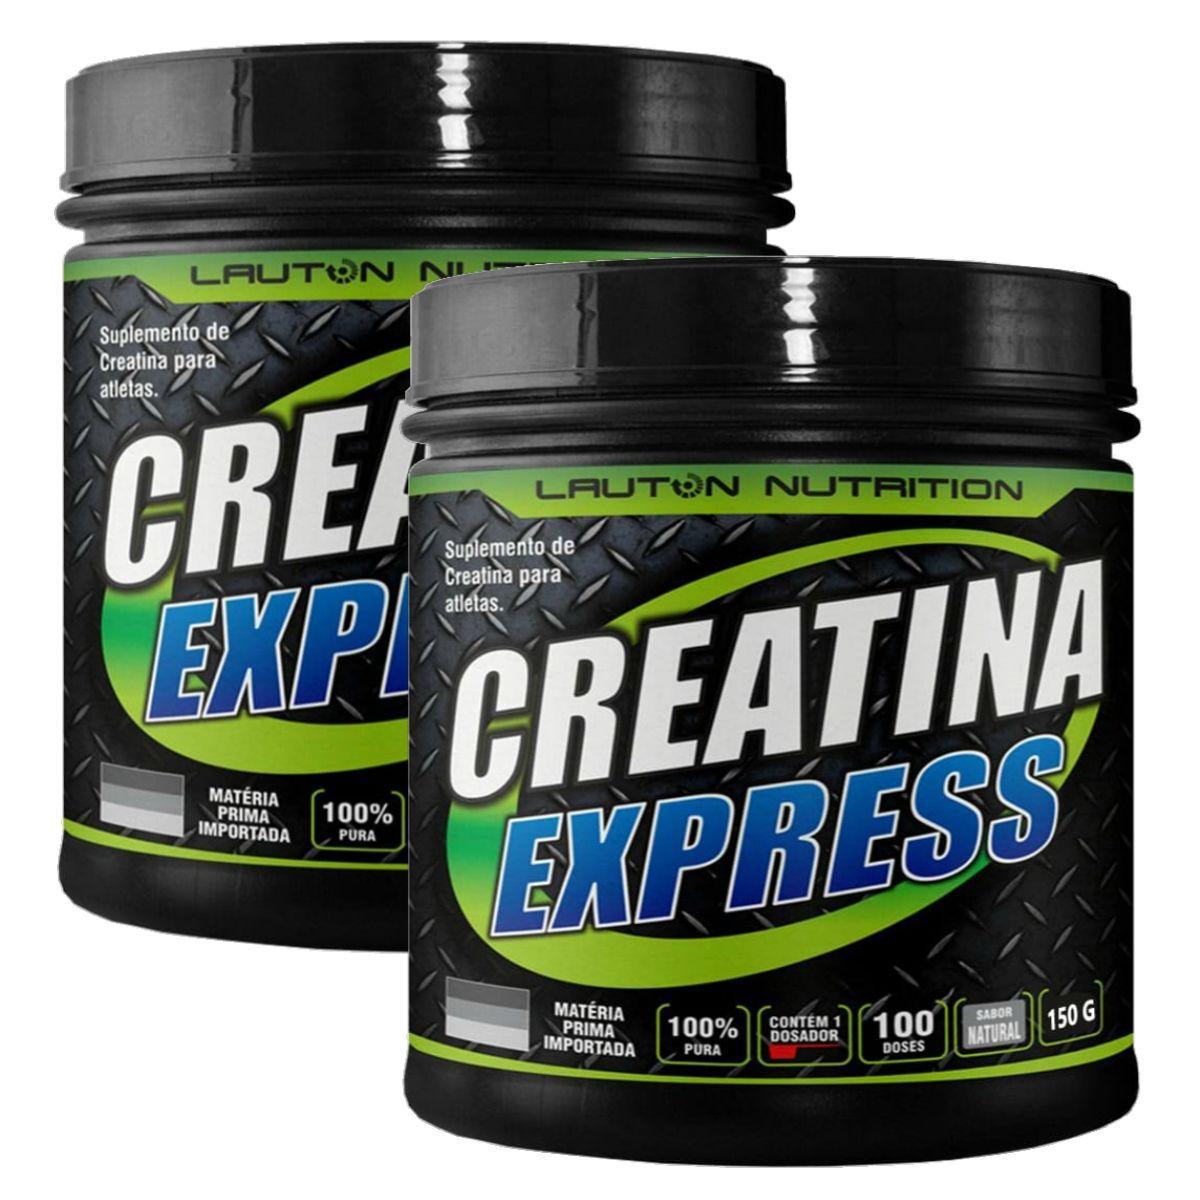 Kit 2 Creatinas Express 100% Pura 100g - Lauton Nutrition